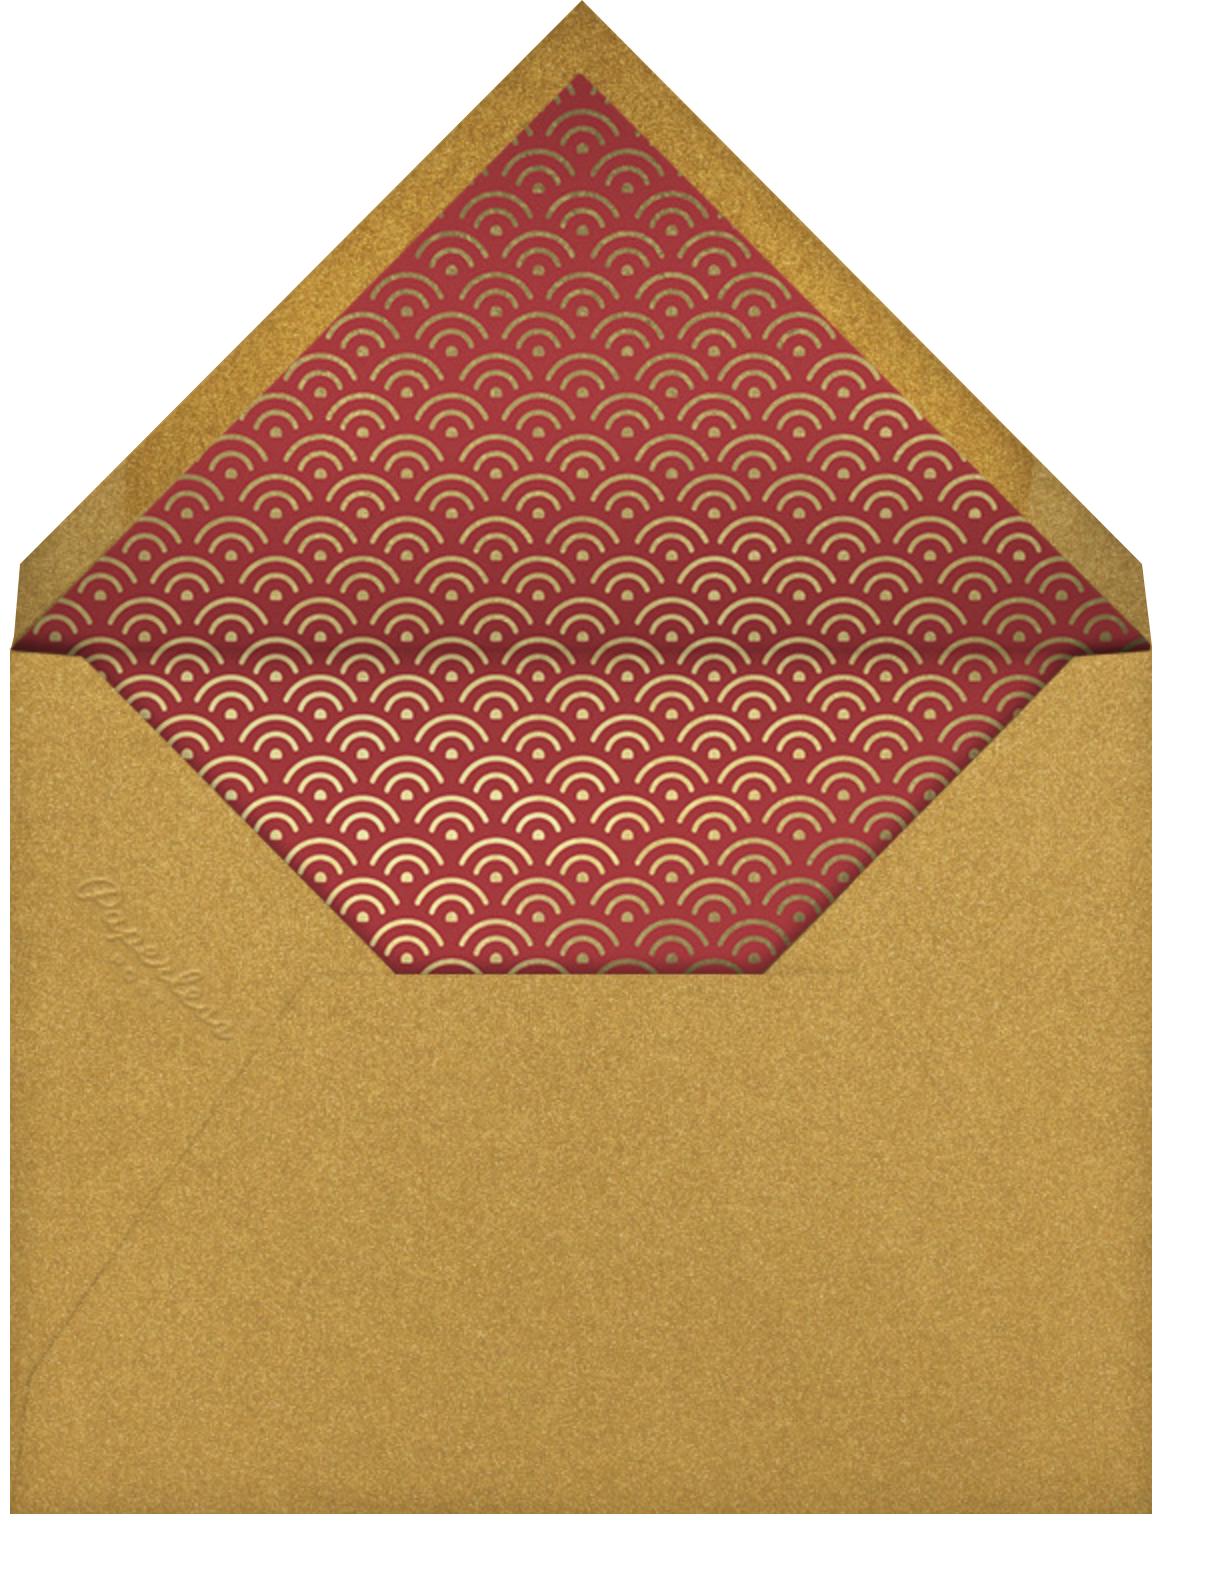 Red Envelope - Paperless Post - Lunar New Year - envelope back